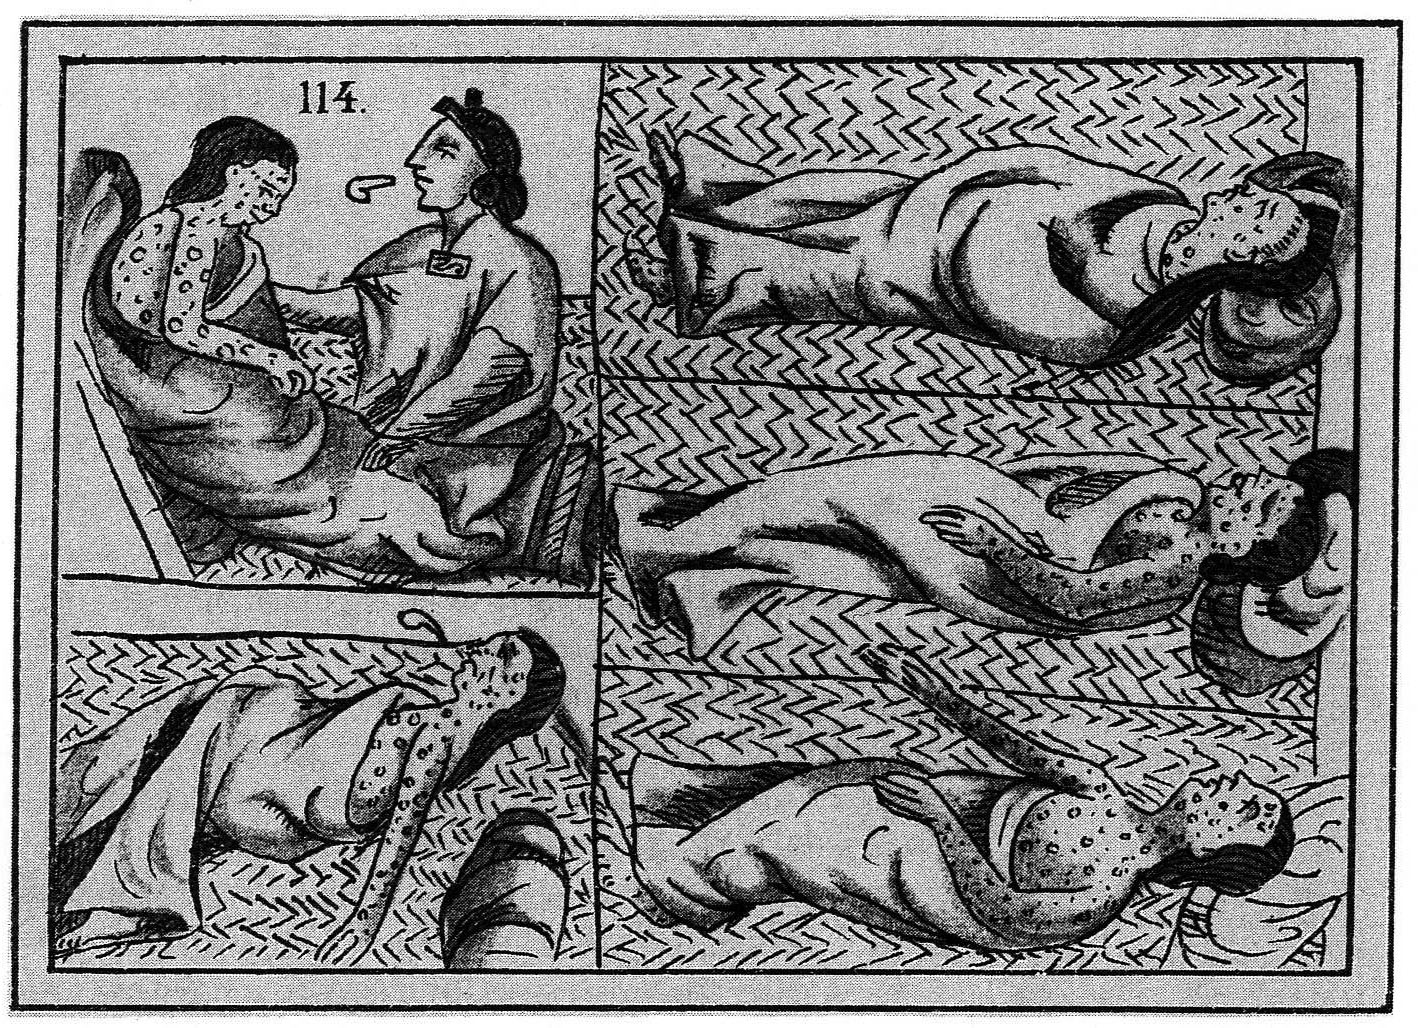 The Columbian Exchange - History Illustrated